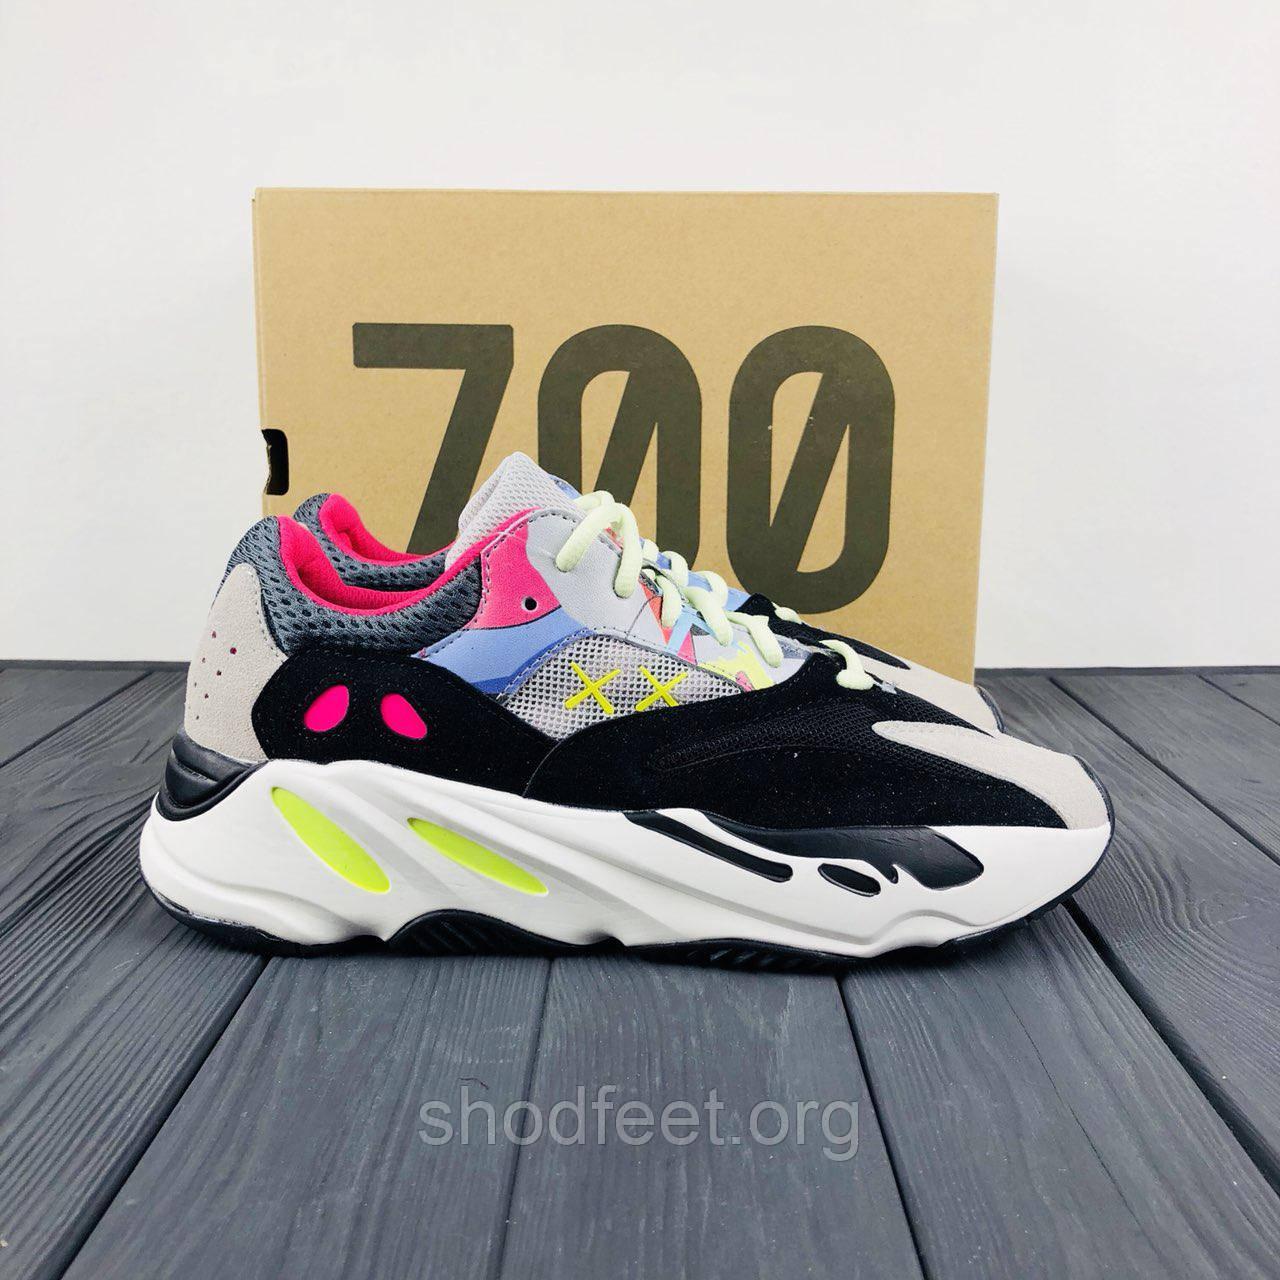 on sale 8bada eecb2 Мужские кроссовки Kaws x Adidas Yeezy Boost 700 Runner